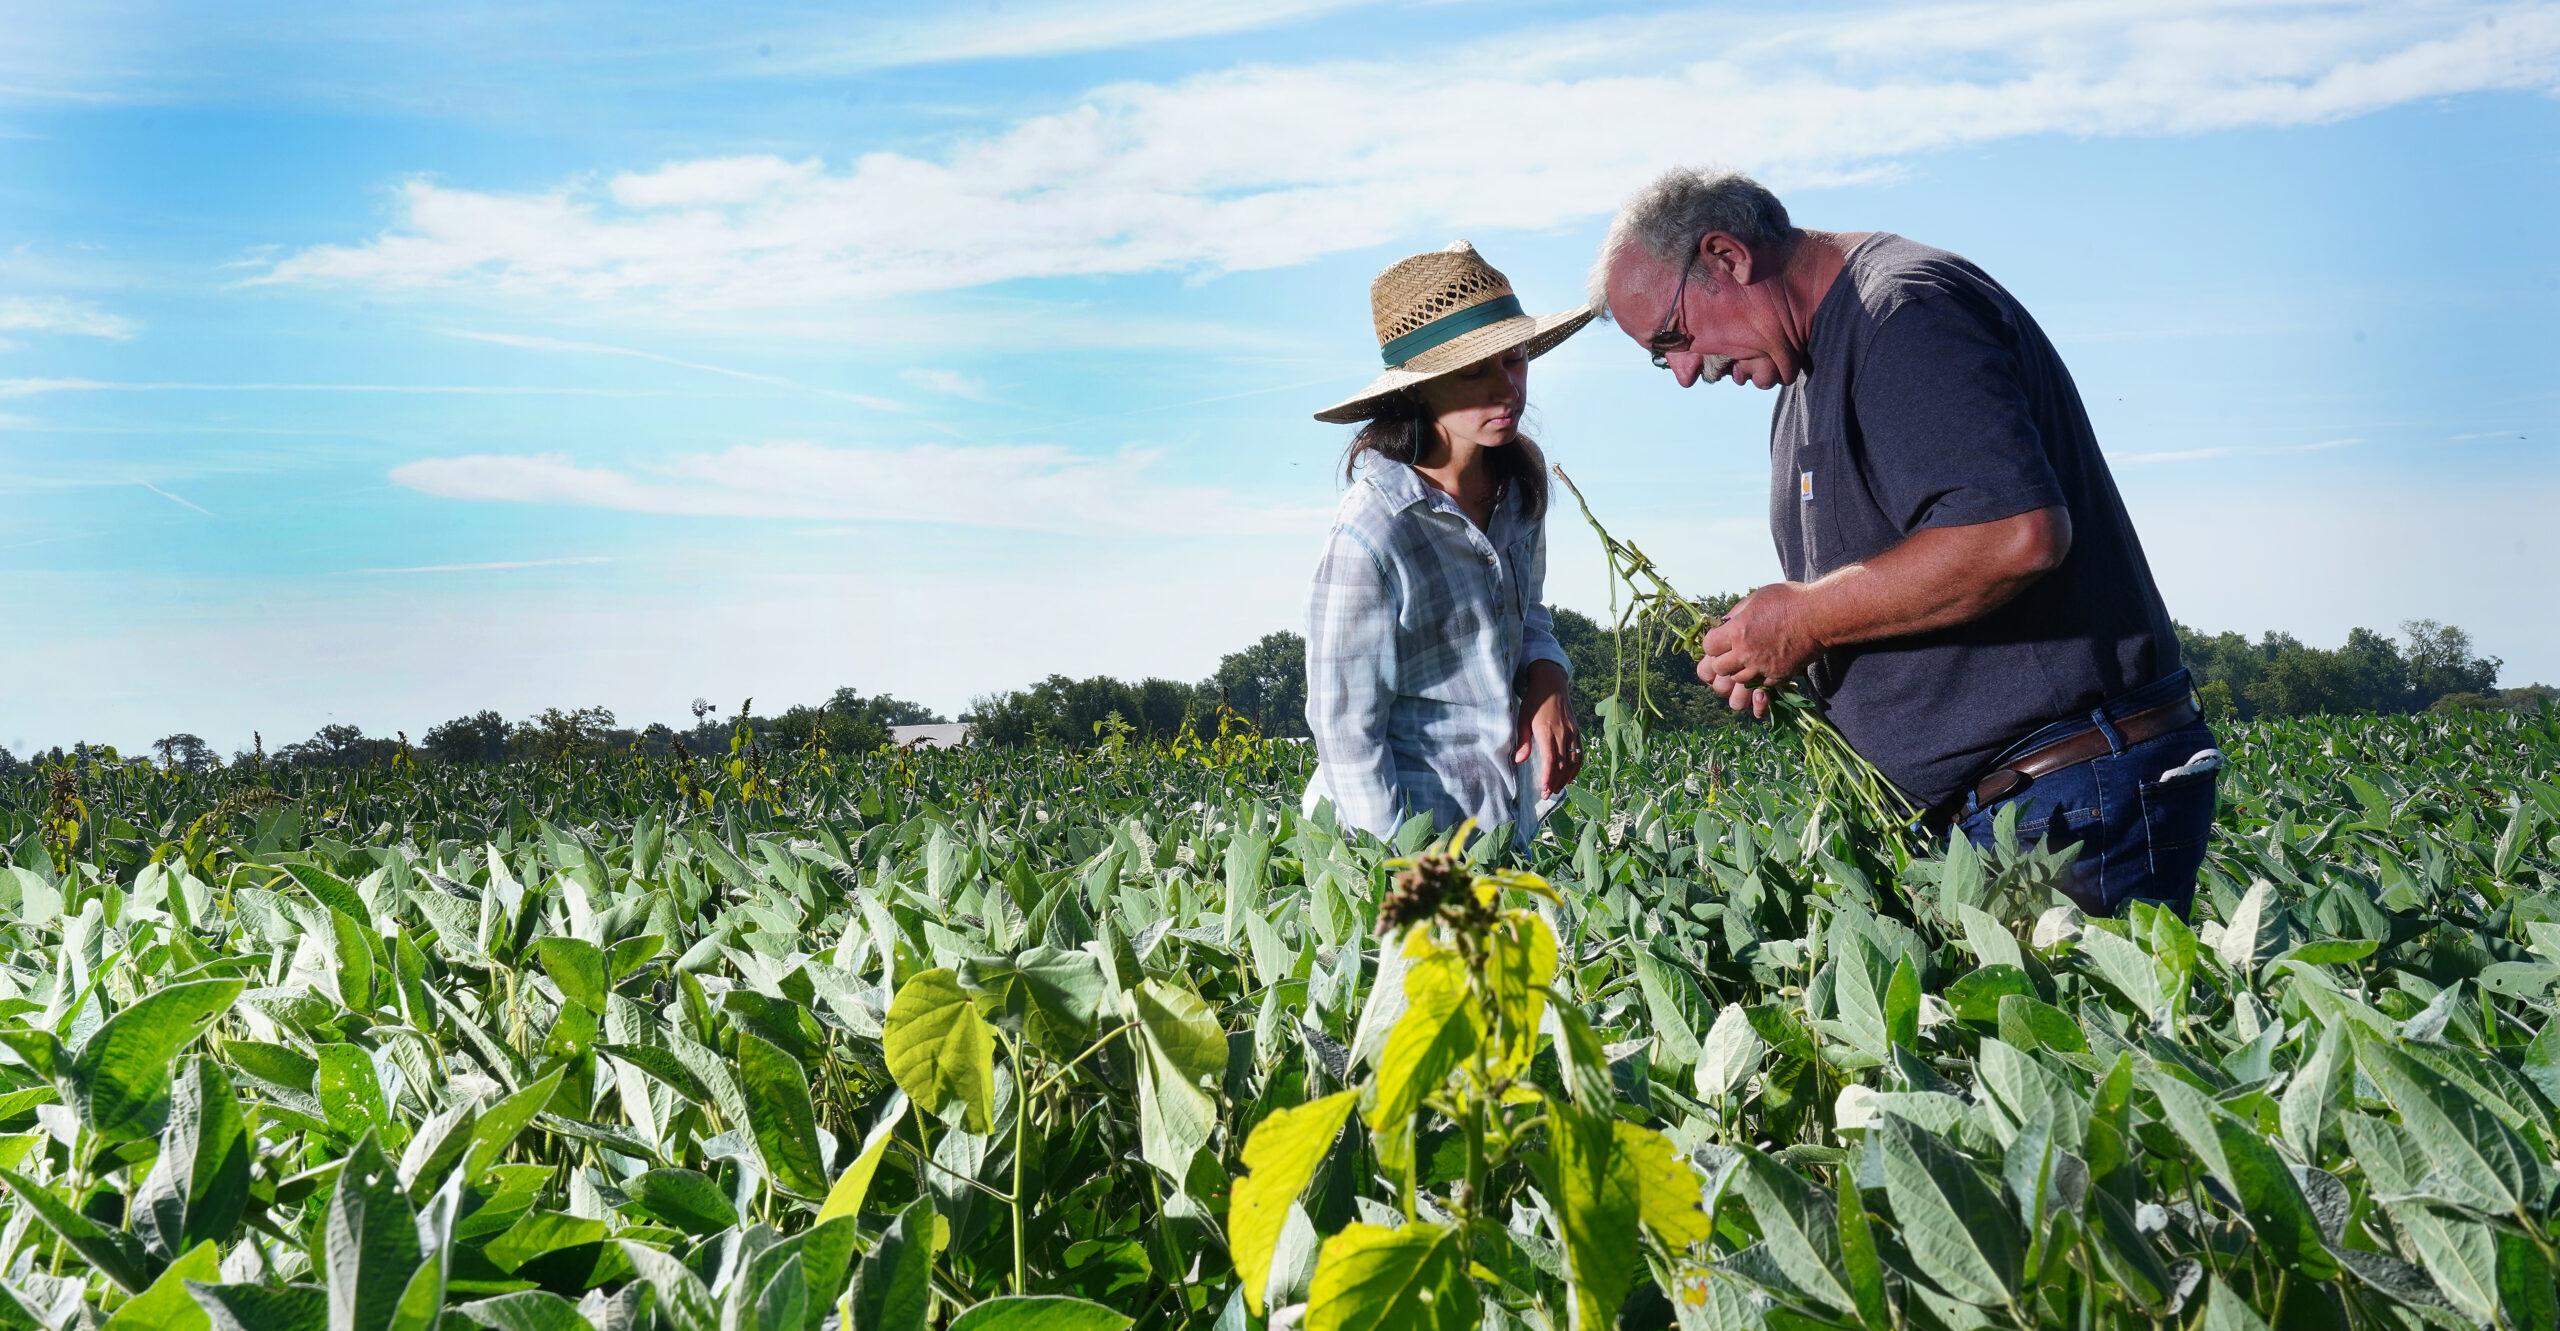 two people in a field